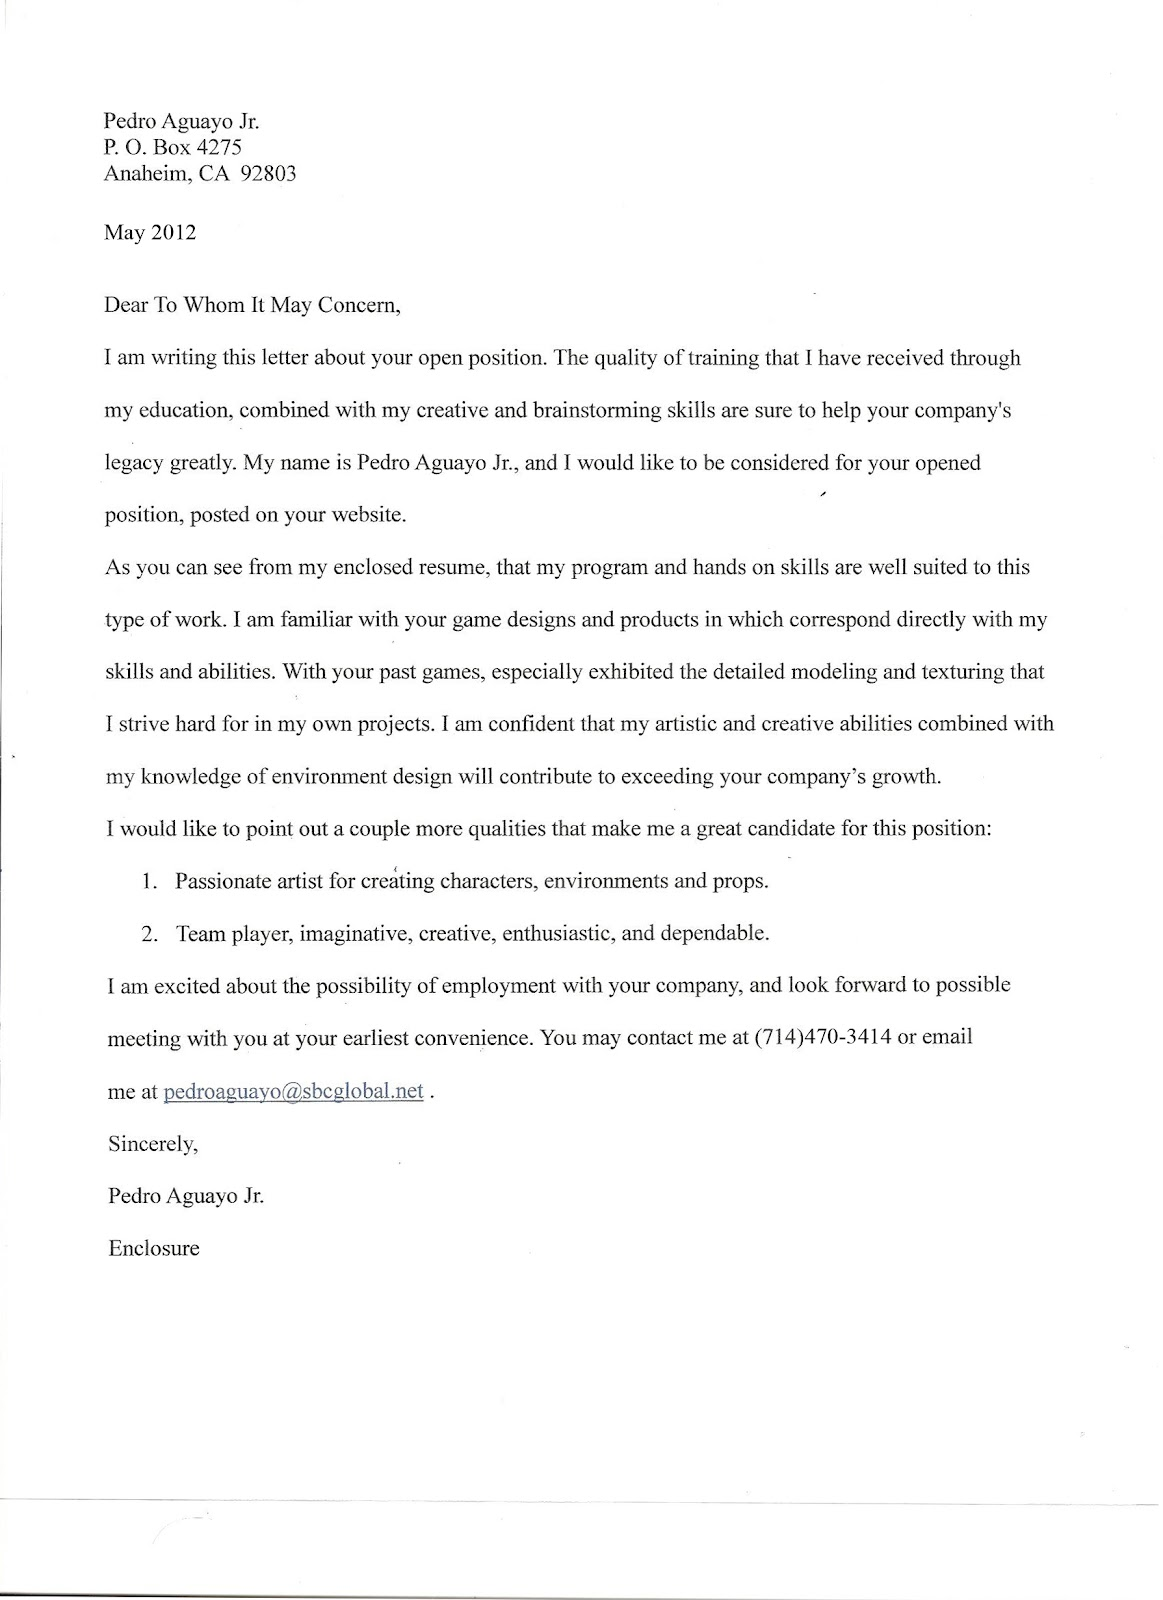 plain text resume text resumes plain text resume samples plain text resume converter documents text resumes plain text resume samples plain text resume converter documents